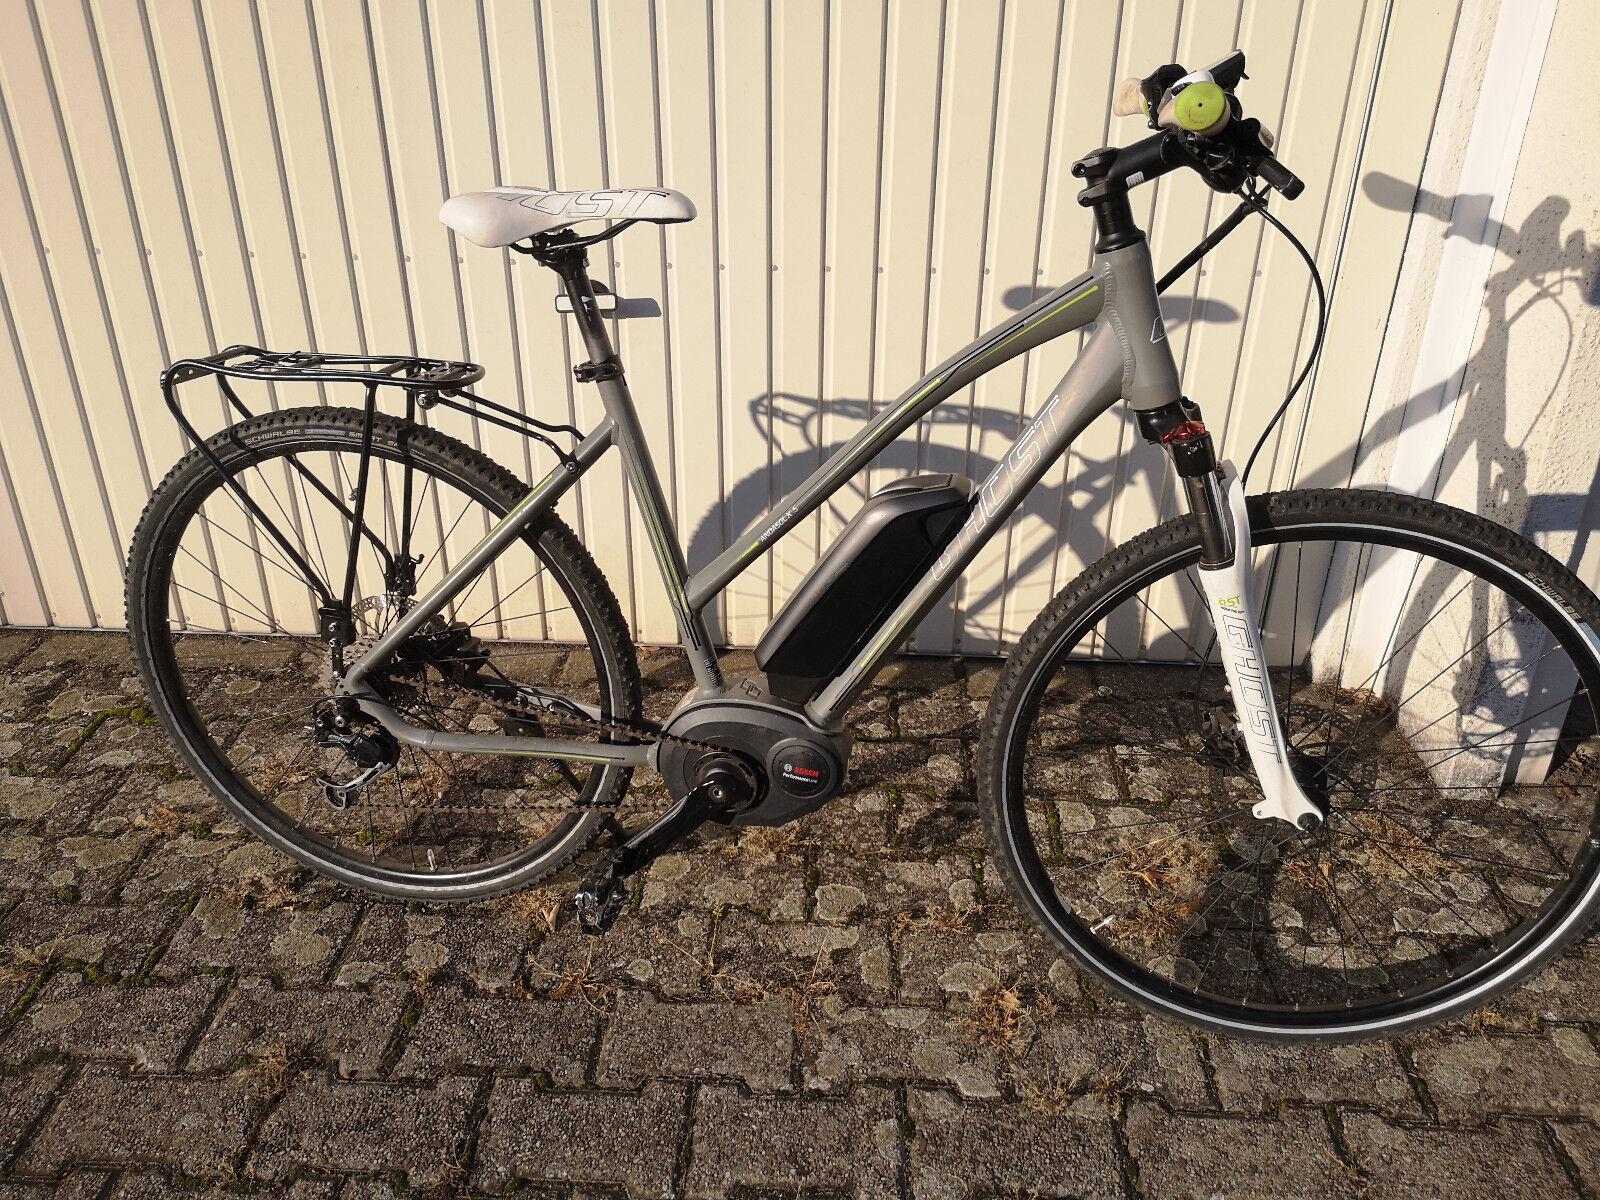 GHOST Andasol E-bike Ebike mit Bosch Performance Motor 500wh Akku